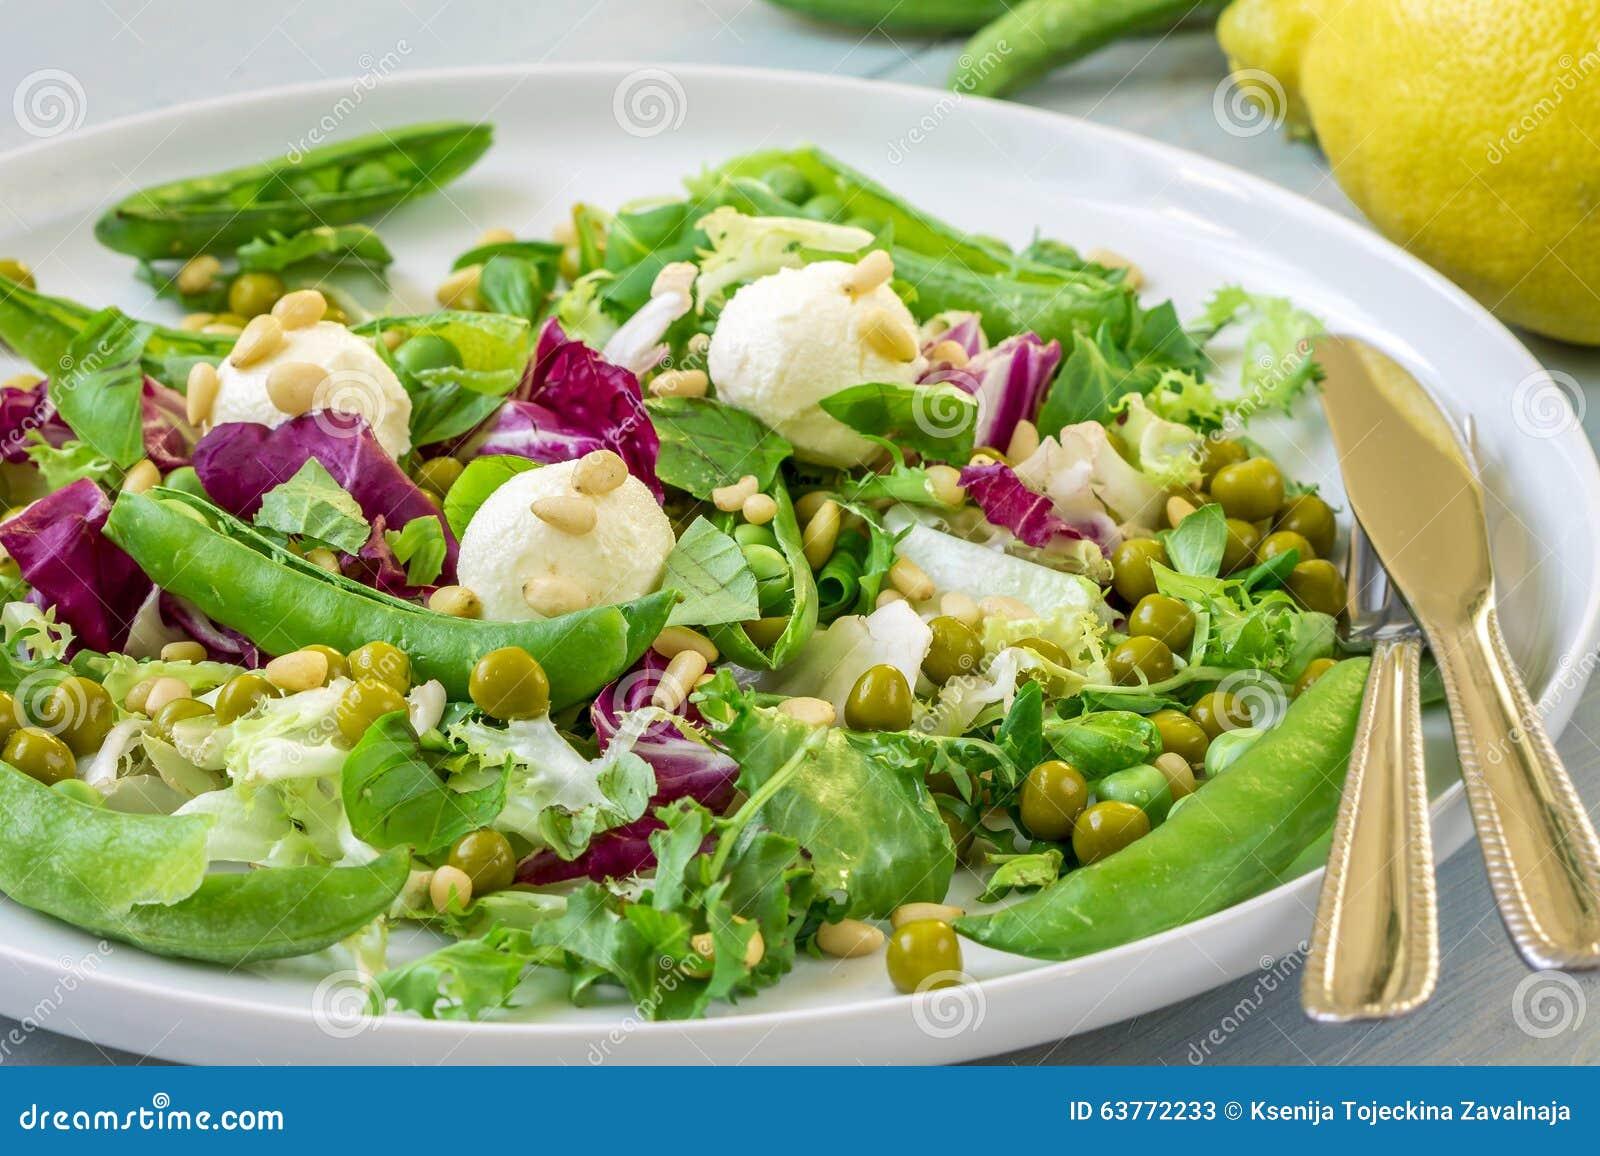 salade verte avec du fromage de mozzarella image stock - image du